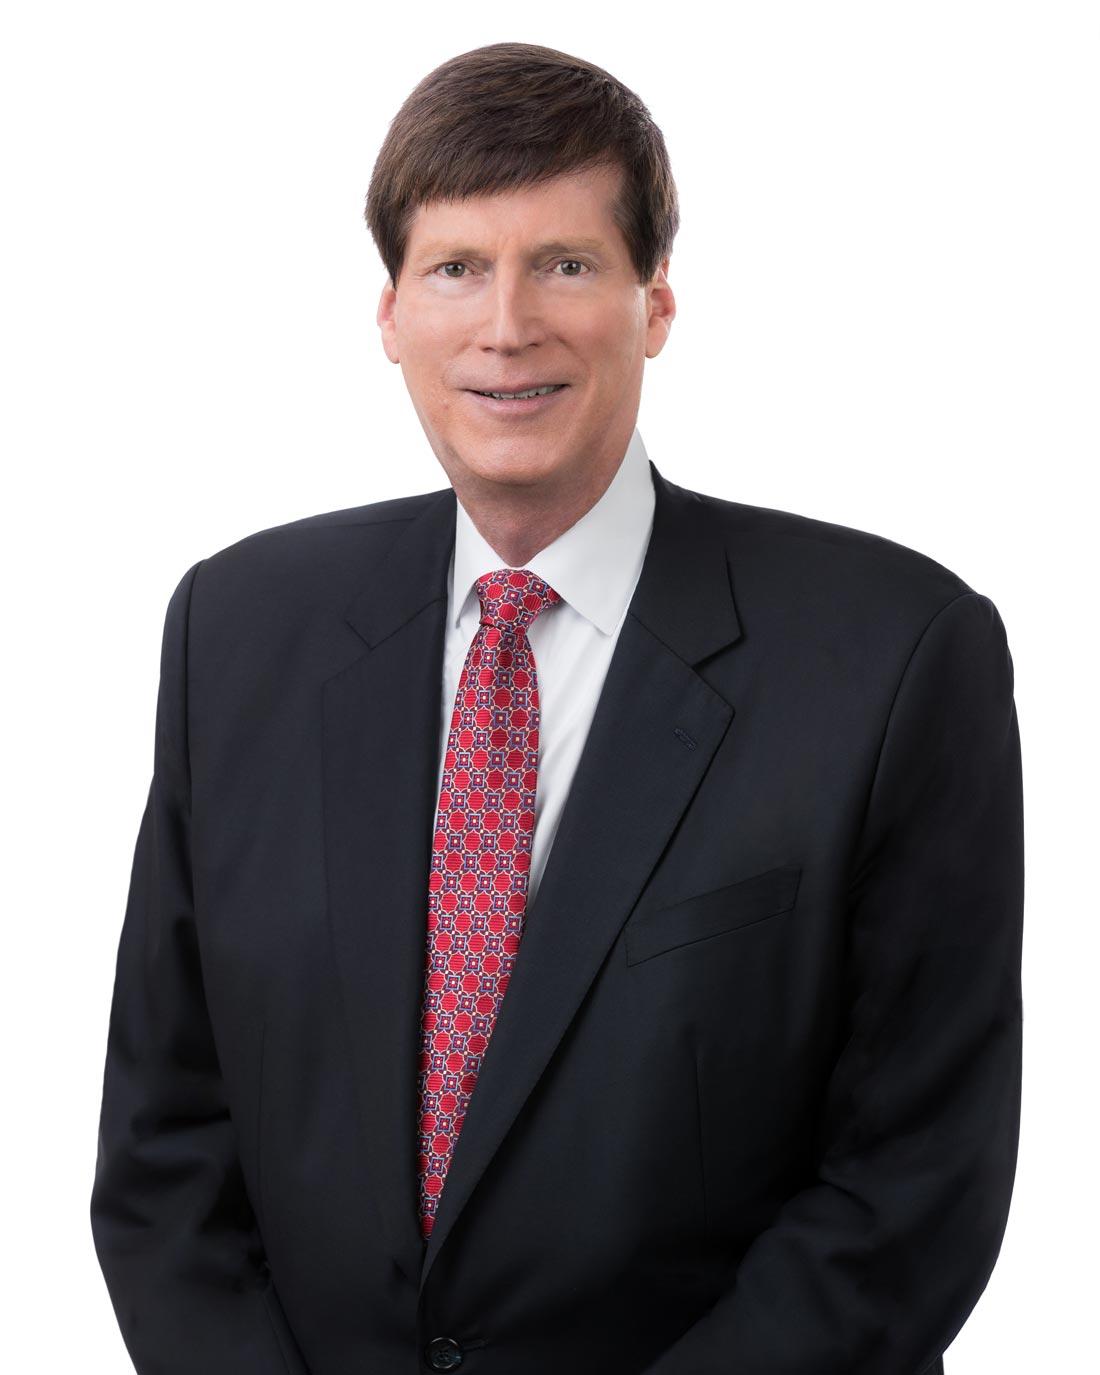 Steve Moskowitz, Tax Attorney & Founder, Moskowitz, LLP